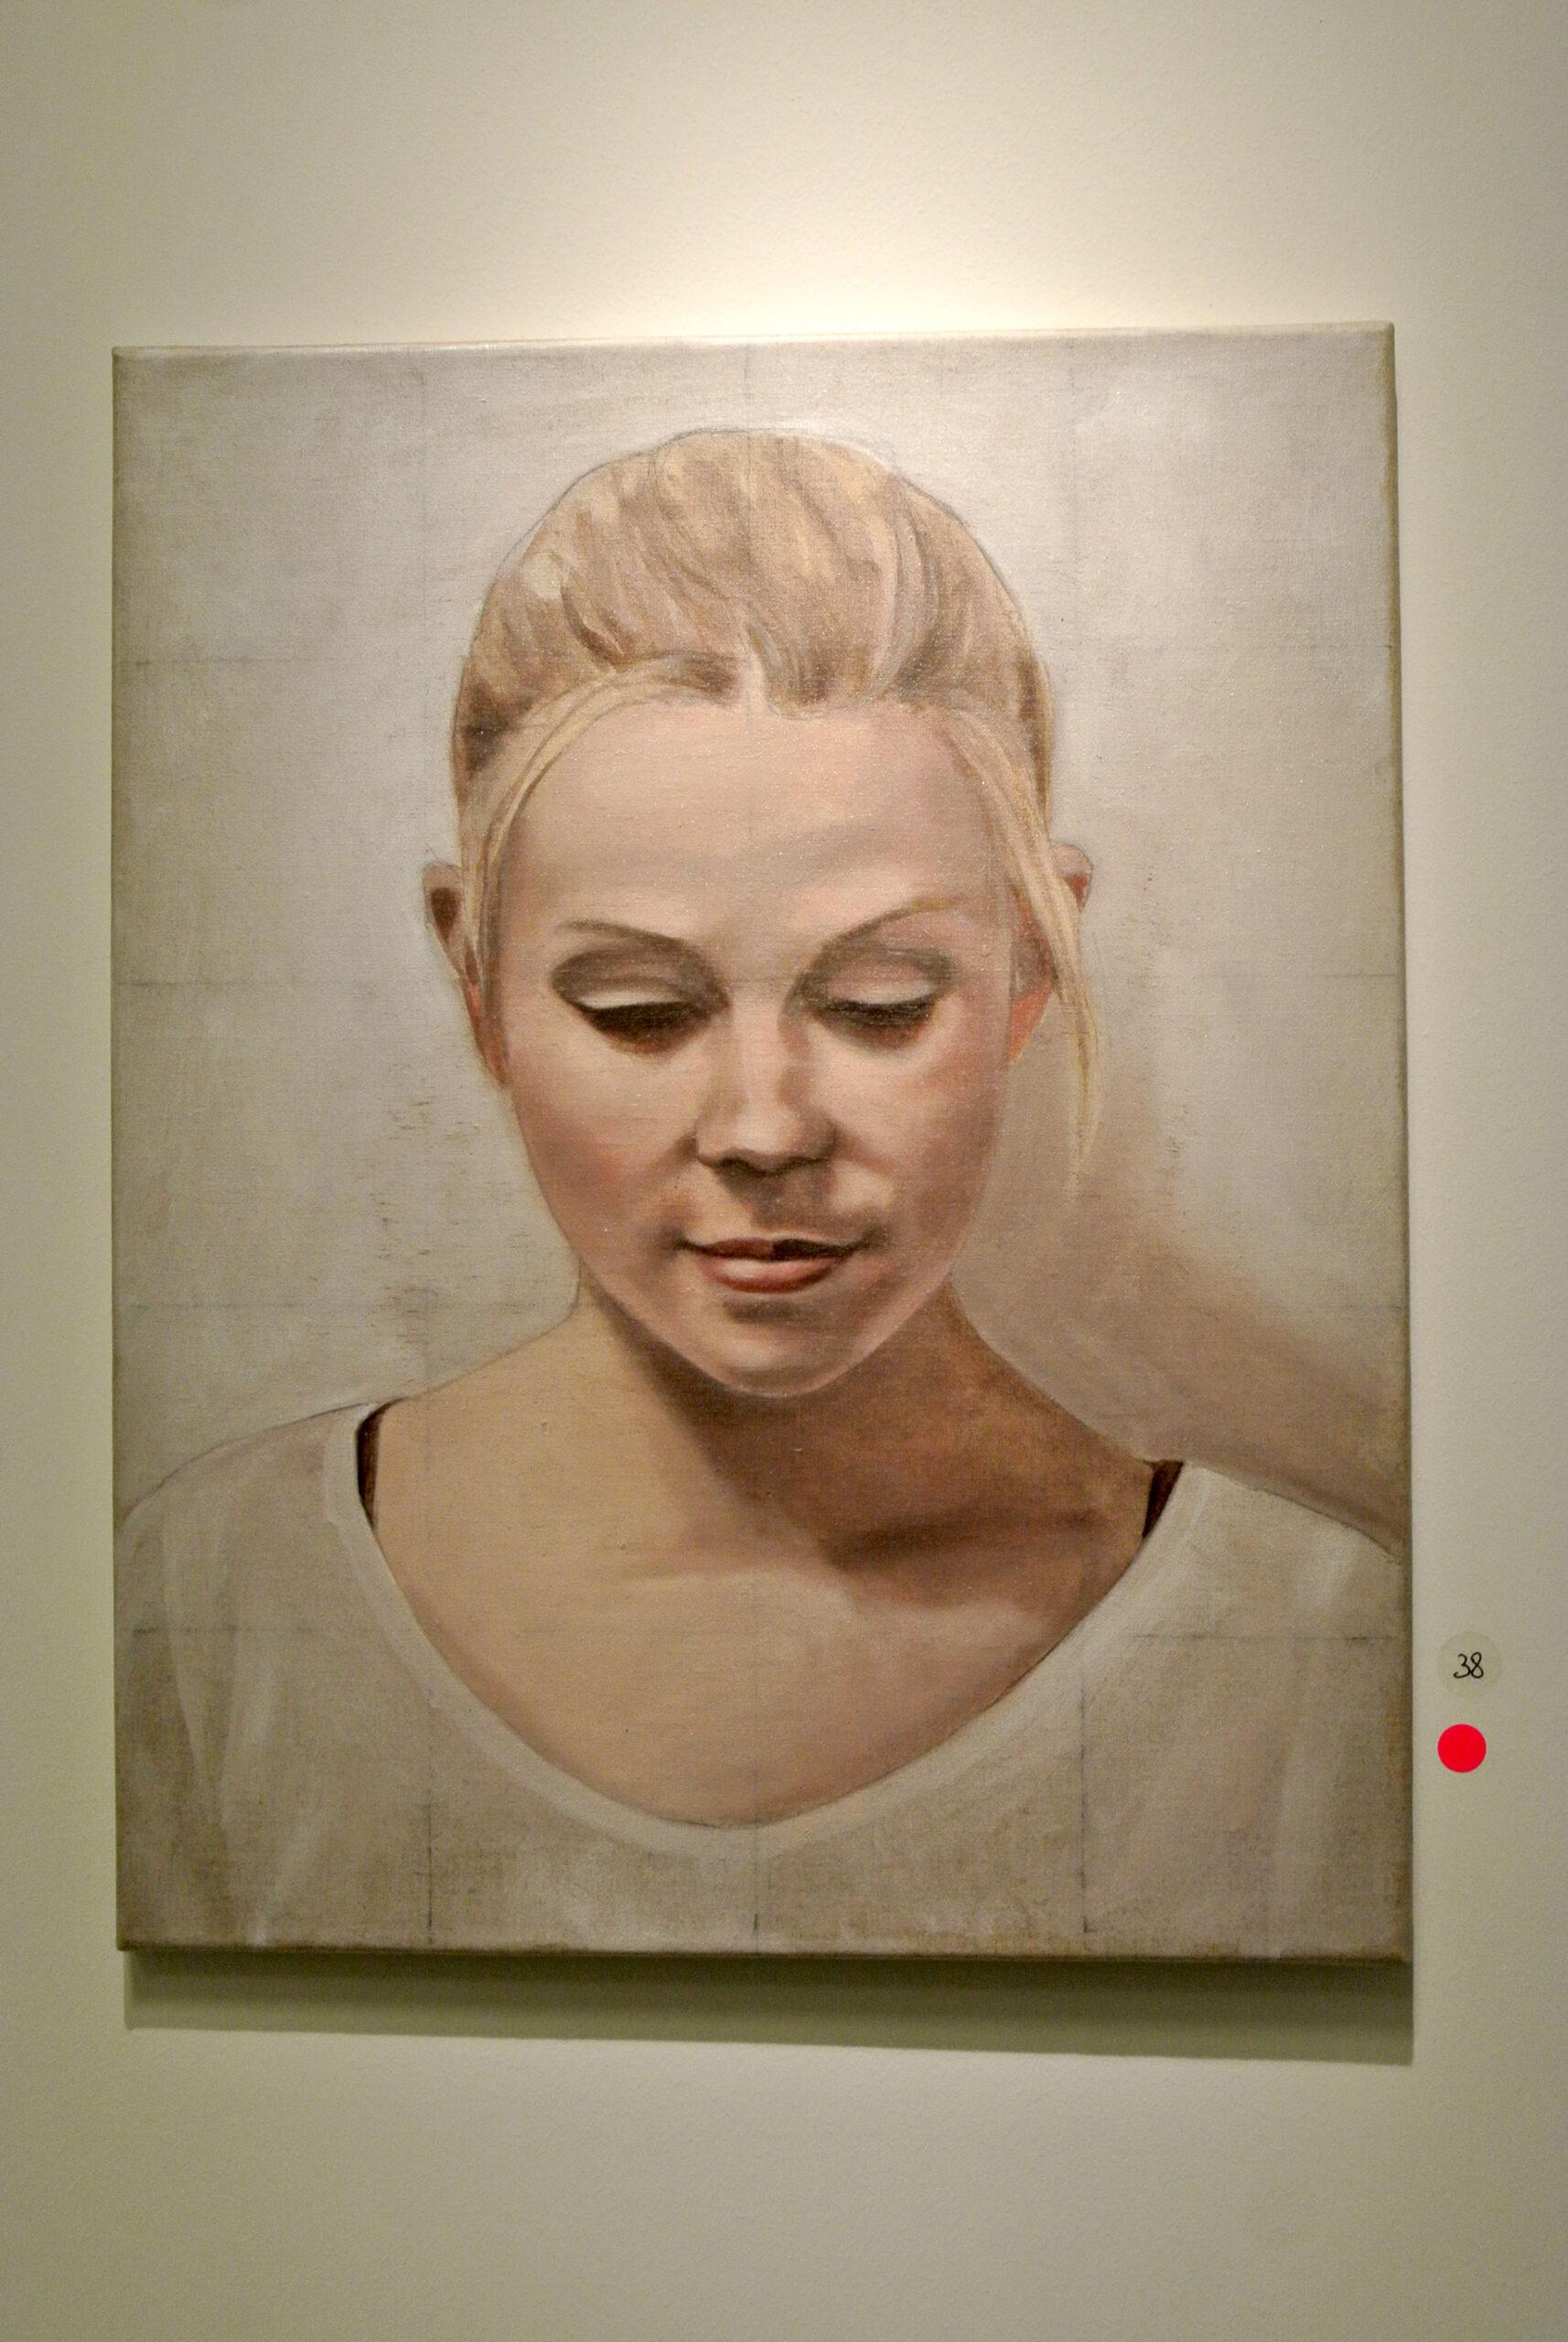 Nadrau: Anna, Öl auf Leinwand, 40 x 50 cm, 1.800 eur